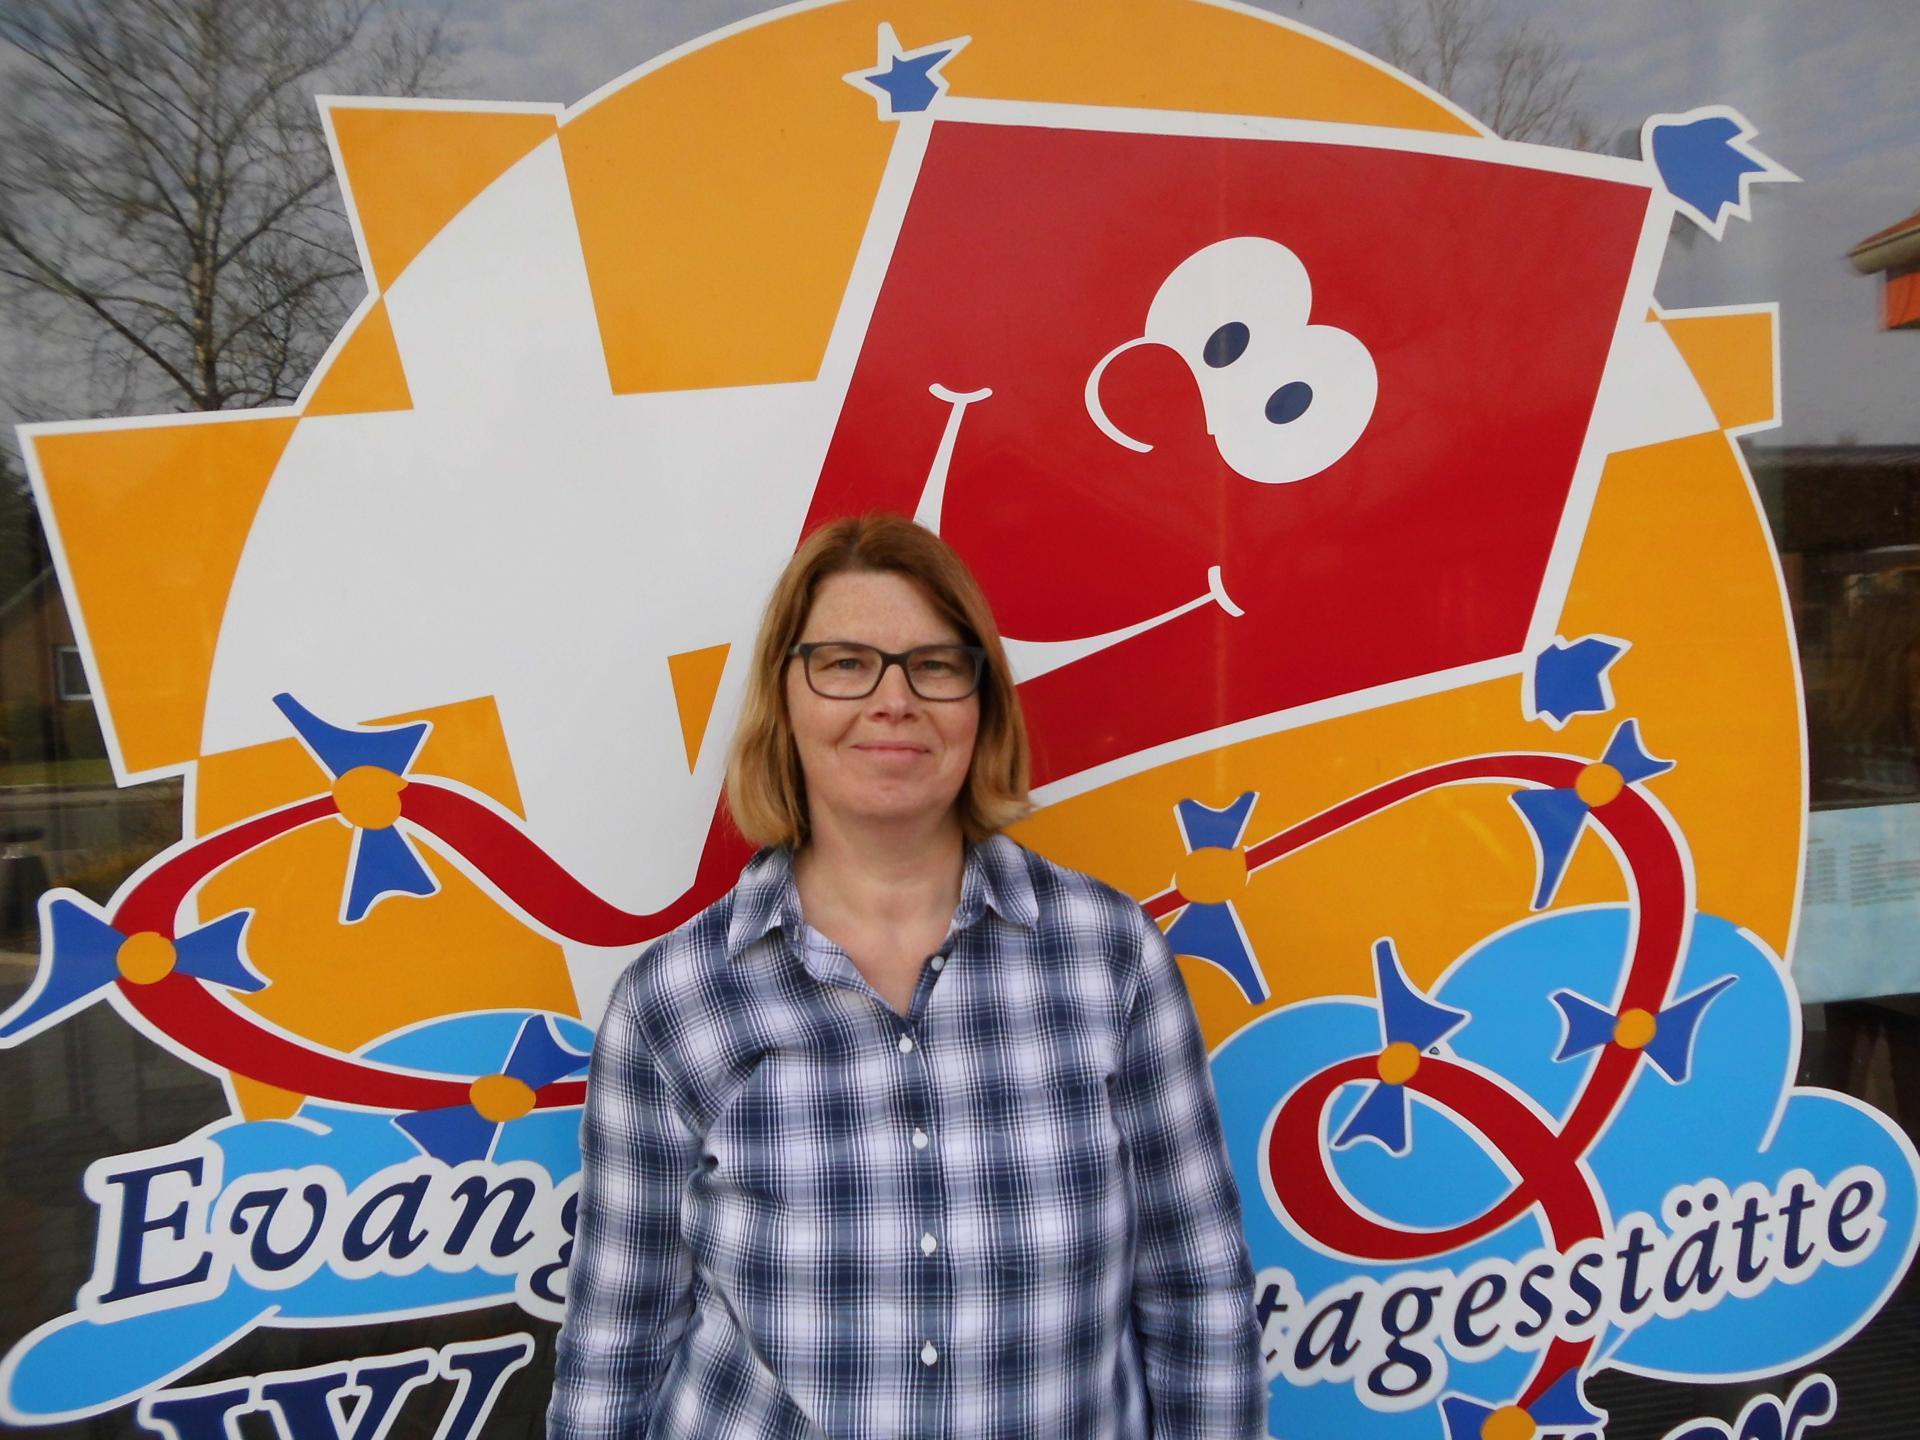 Ulrike Koppelkamm